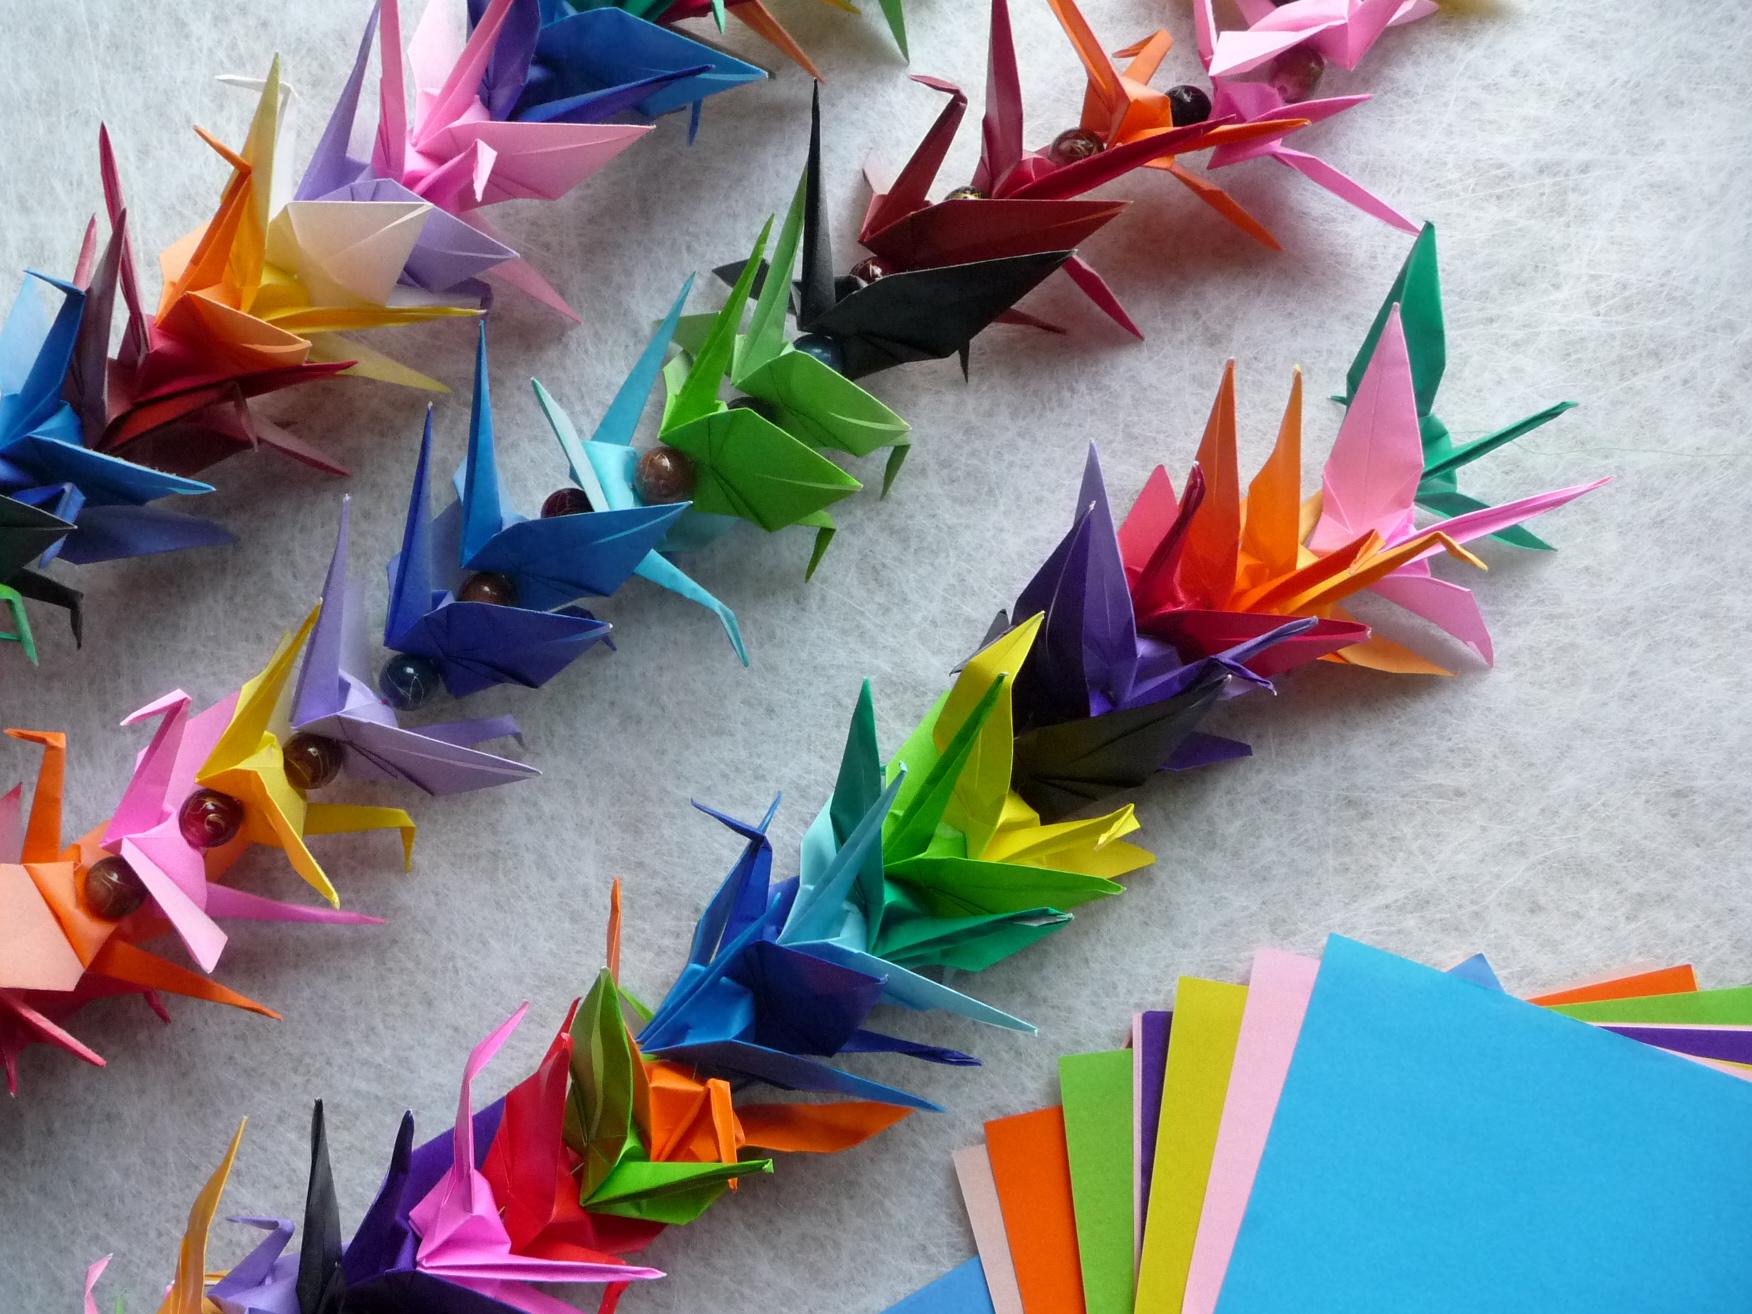 How To Make A Origami Crane Base